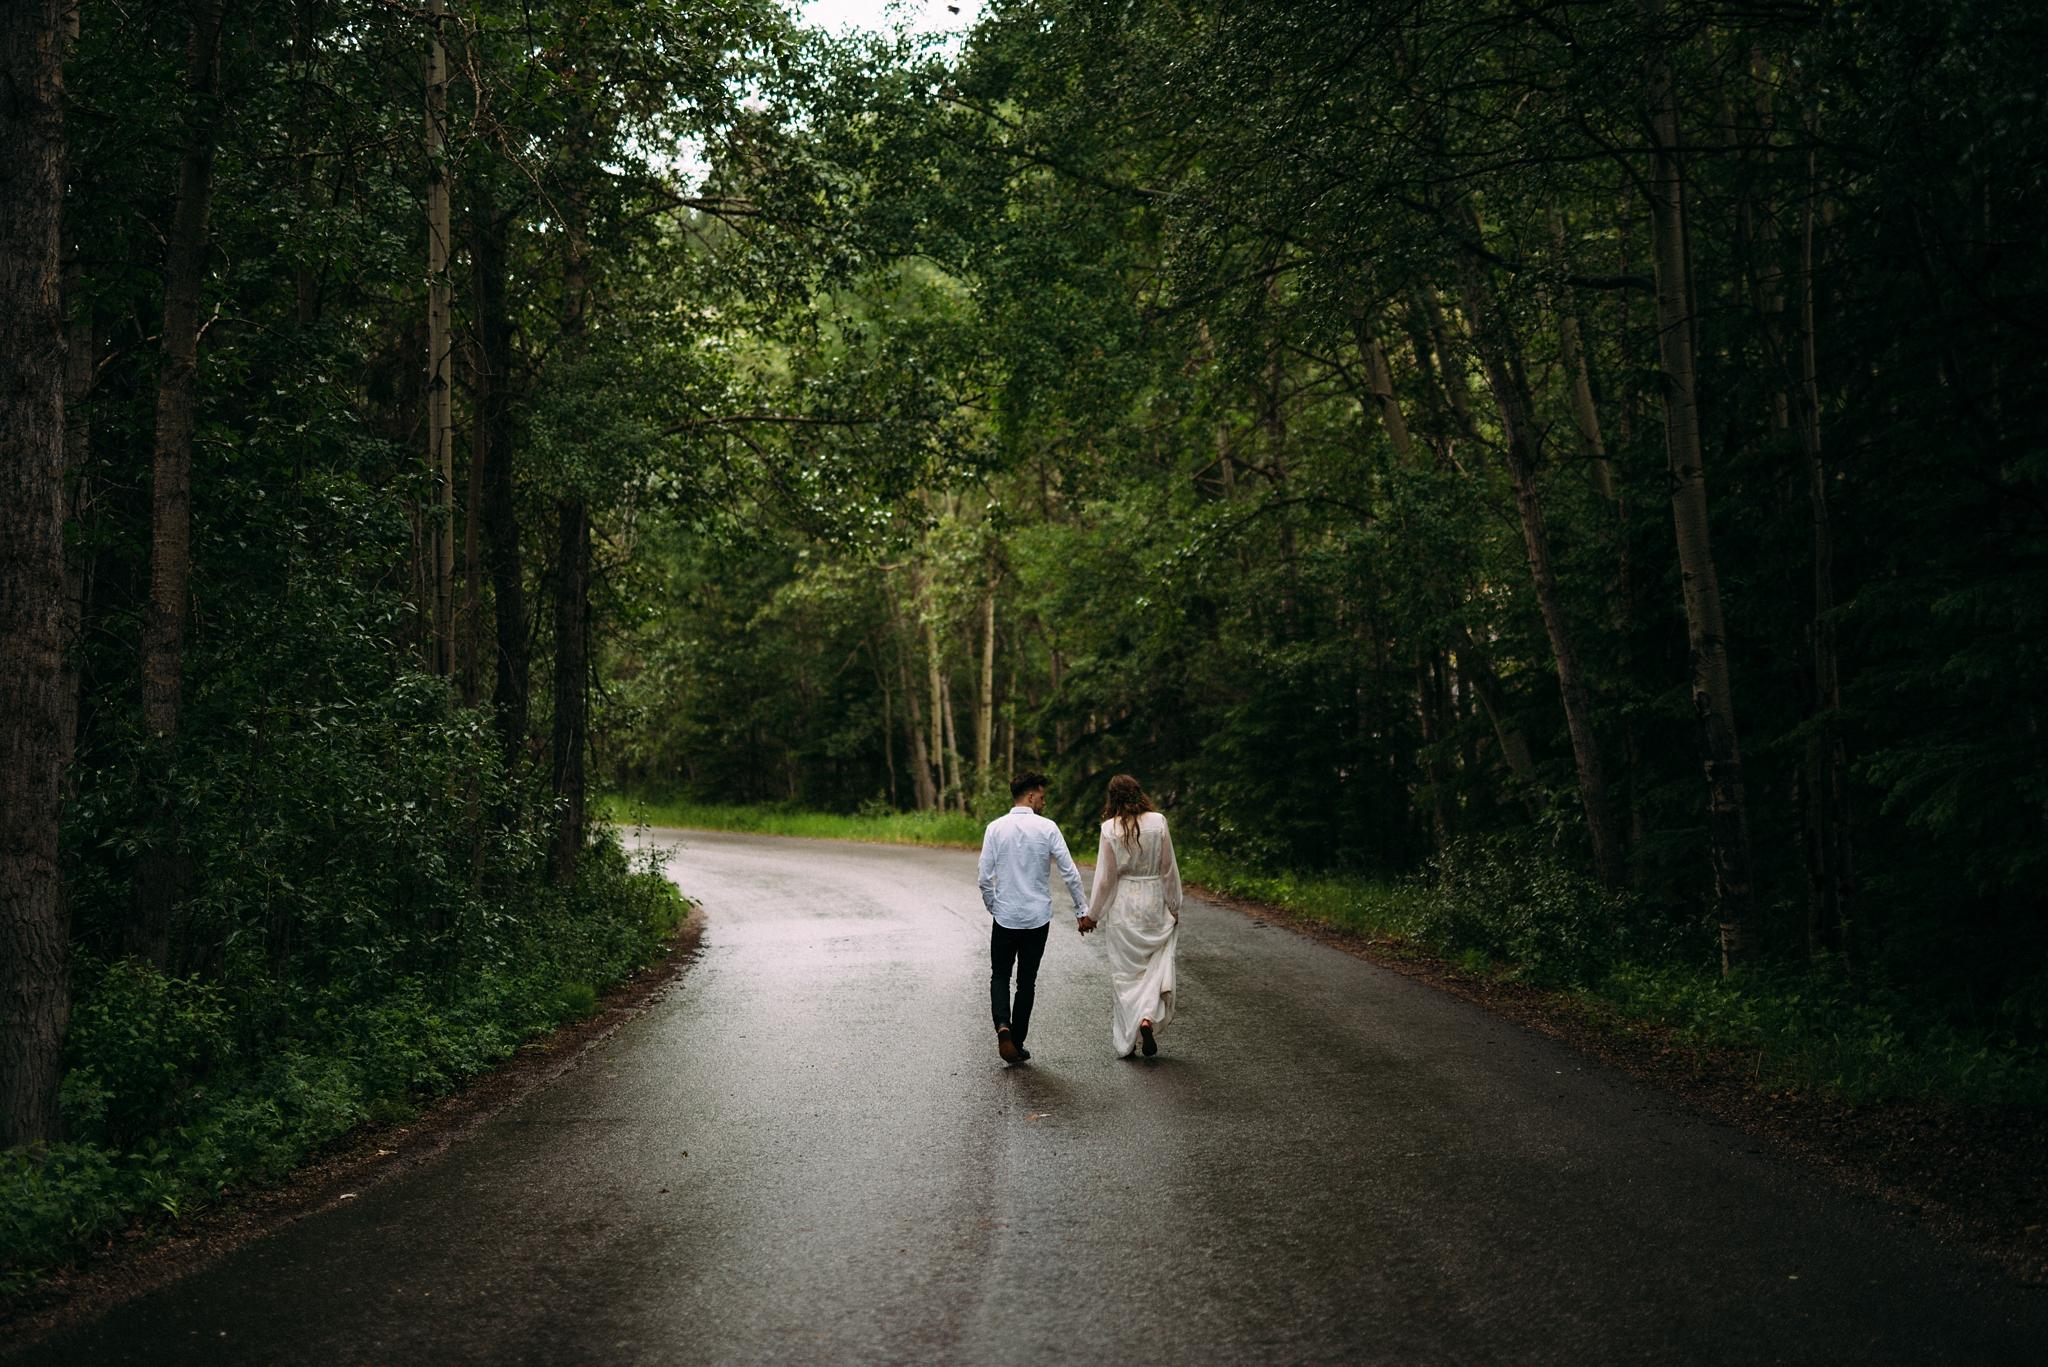 kaihla_tonai_intimate_wedding_elopement_photographer_4143